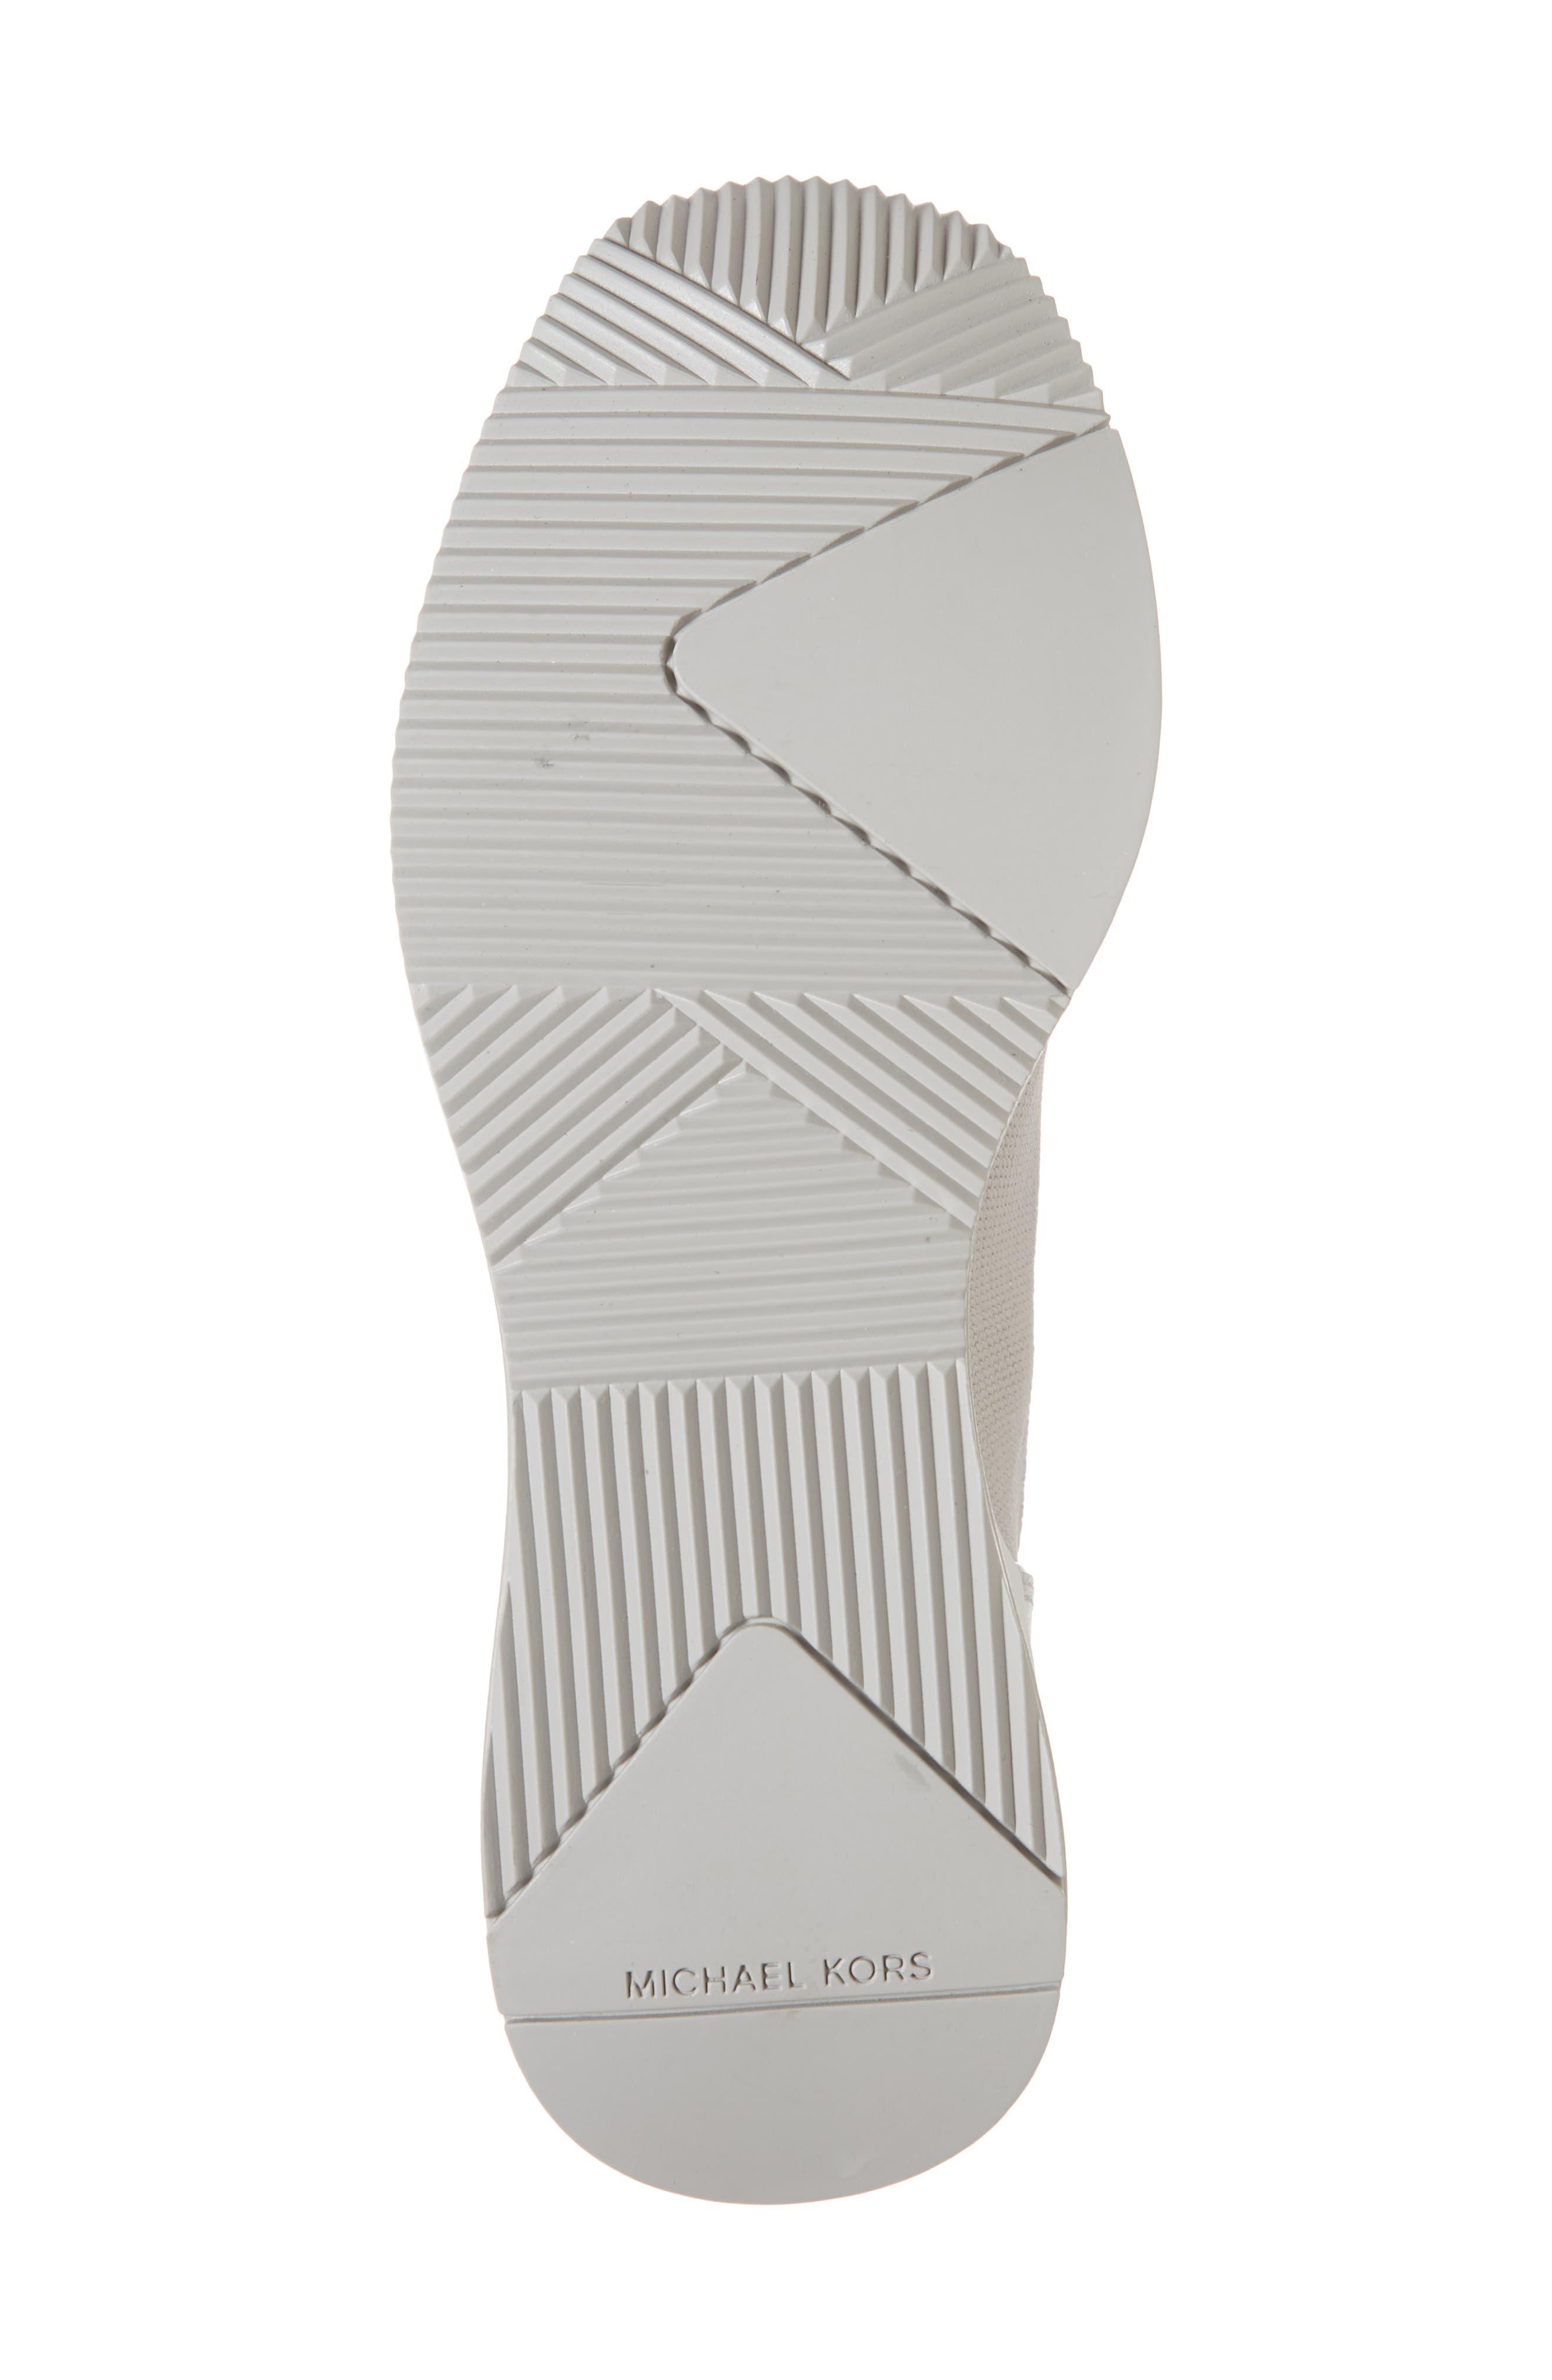 Skyler Knit Bootie,                             Alternate thumbnail 6, color,                             Aluminum/ Silver Knit Fabric